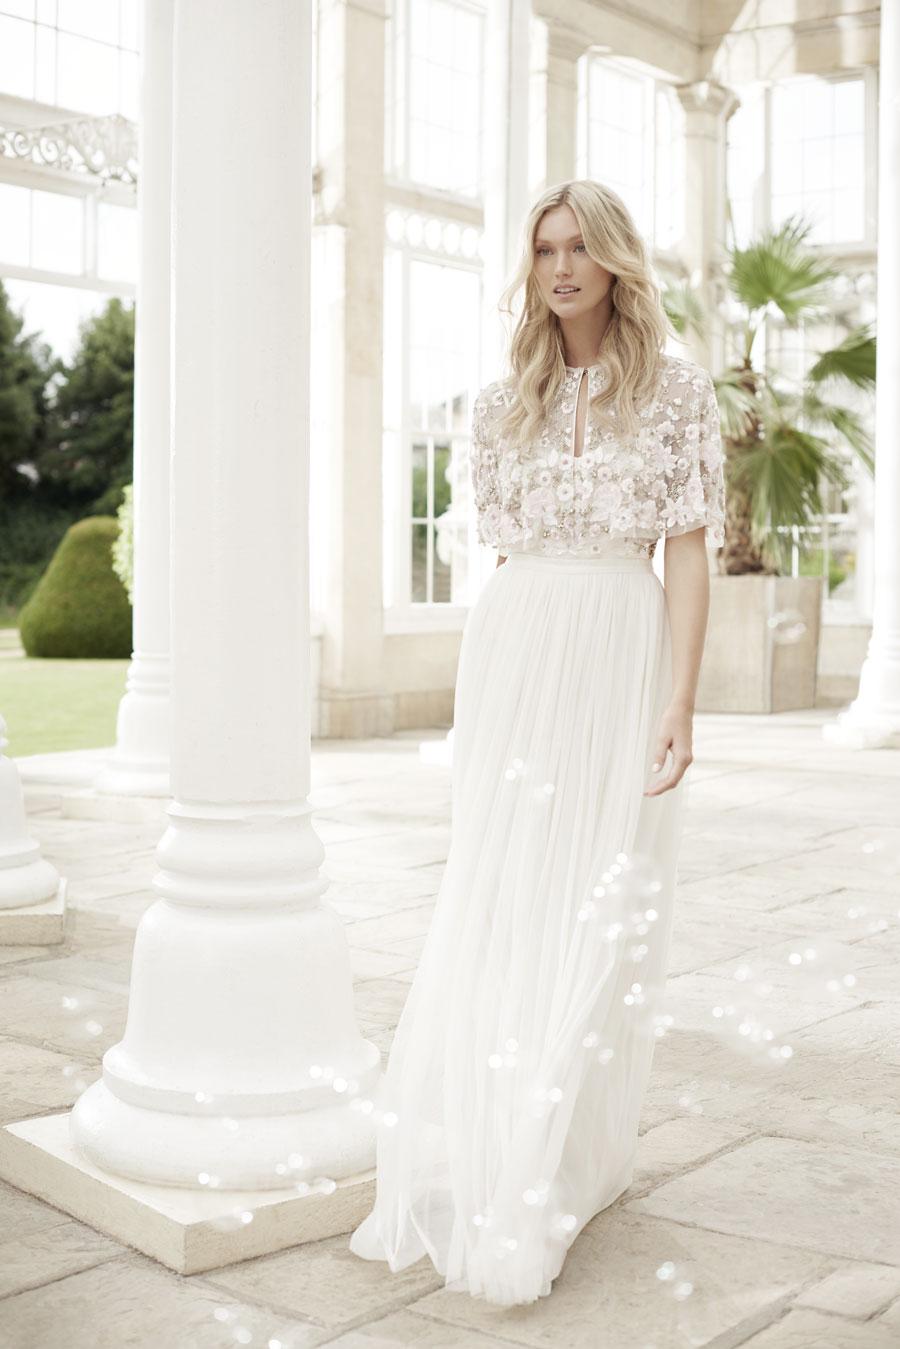 Wonderfully Romantic Wedding Dresses The Needle & Thread